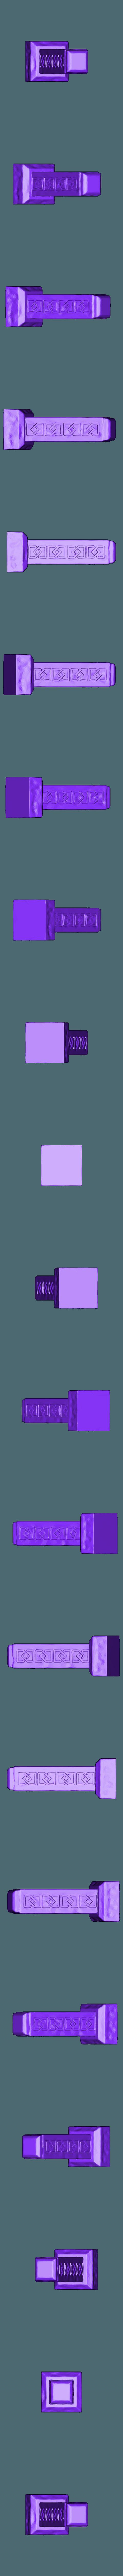 CyclopeanMonumentA.stl Download free STL file ScatterBlocks: Cyclopean Monument (28mm/Heroic scale) • Design to 3D print, Dutchmogul